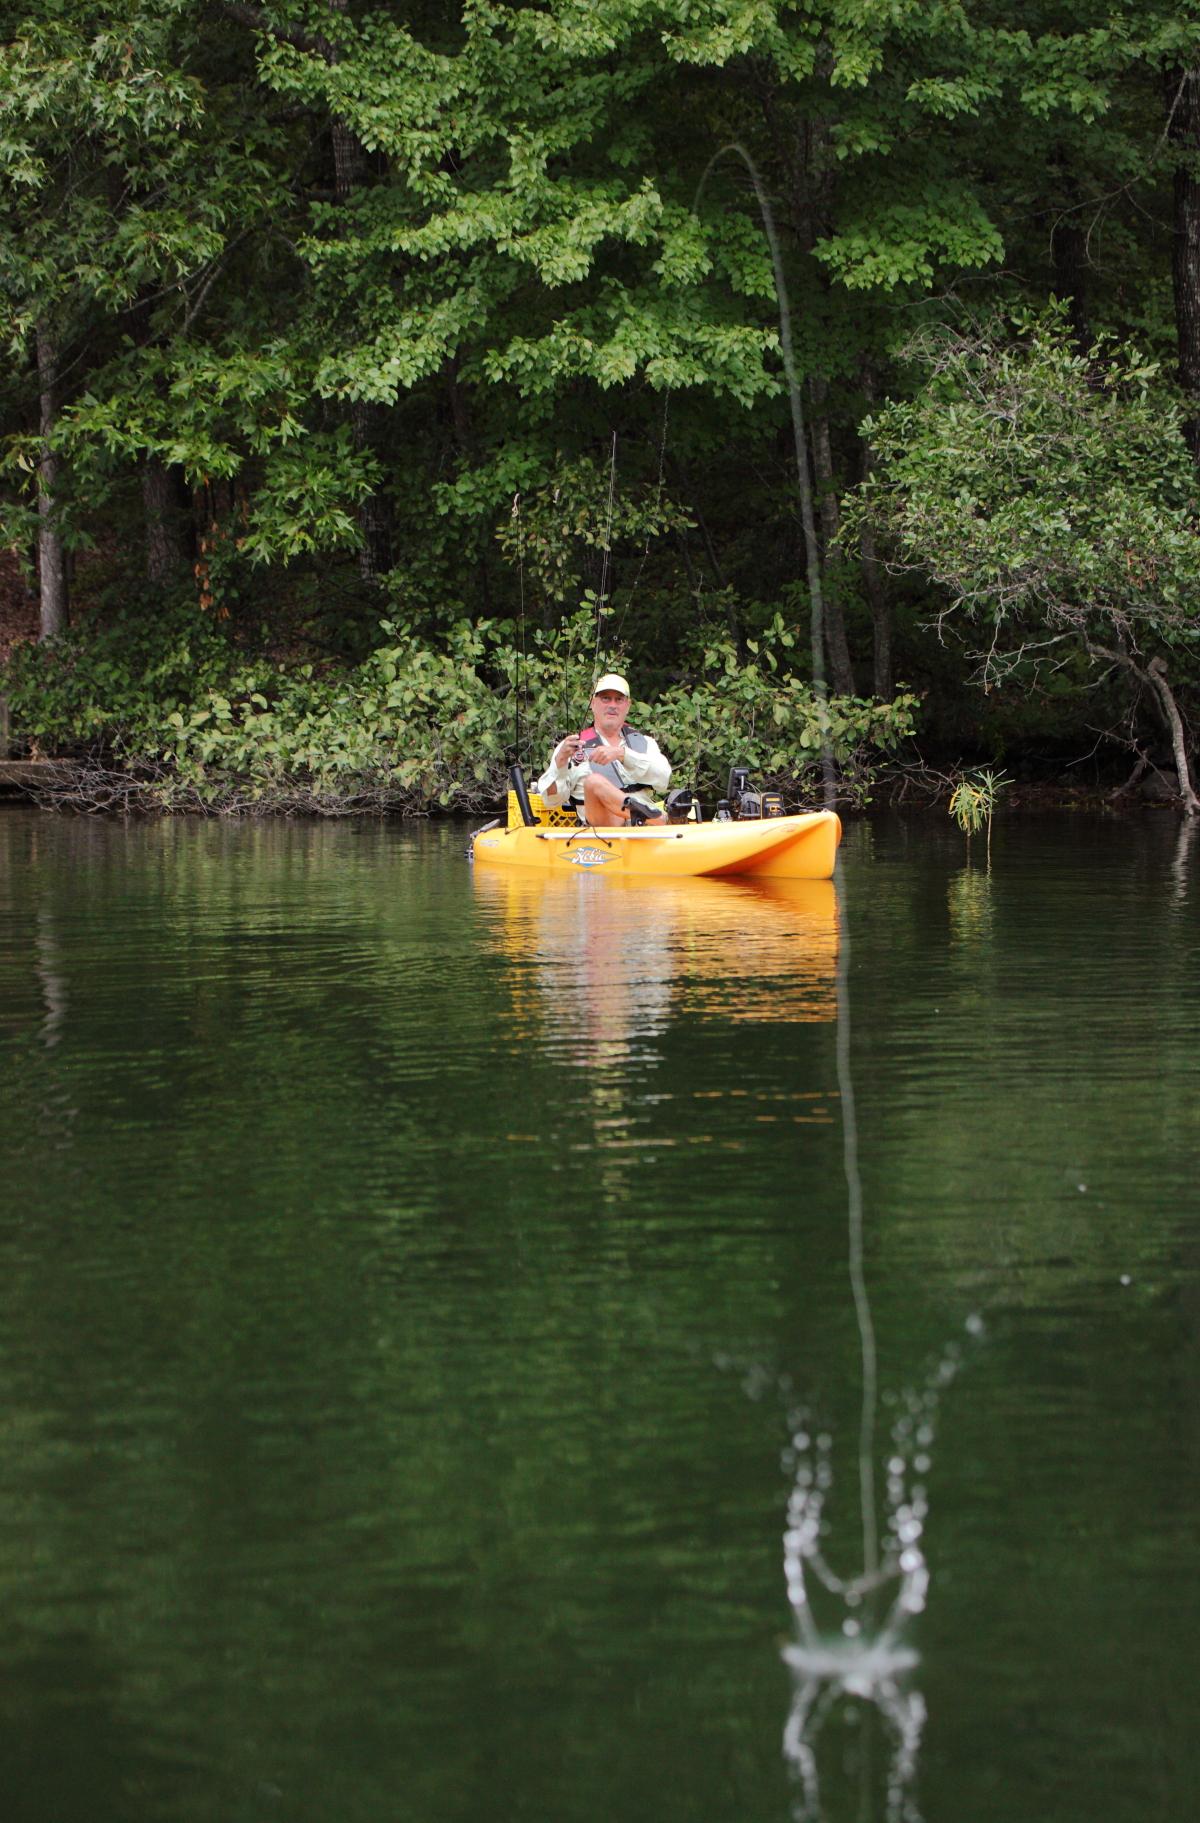 Arkansas resident Peter Trabant, avid kayak fisherman, casts his line into Lake Coronado in Hot Springs Village.